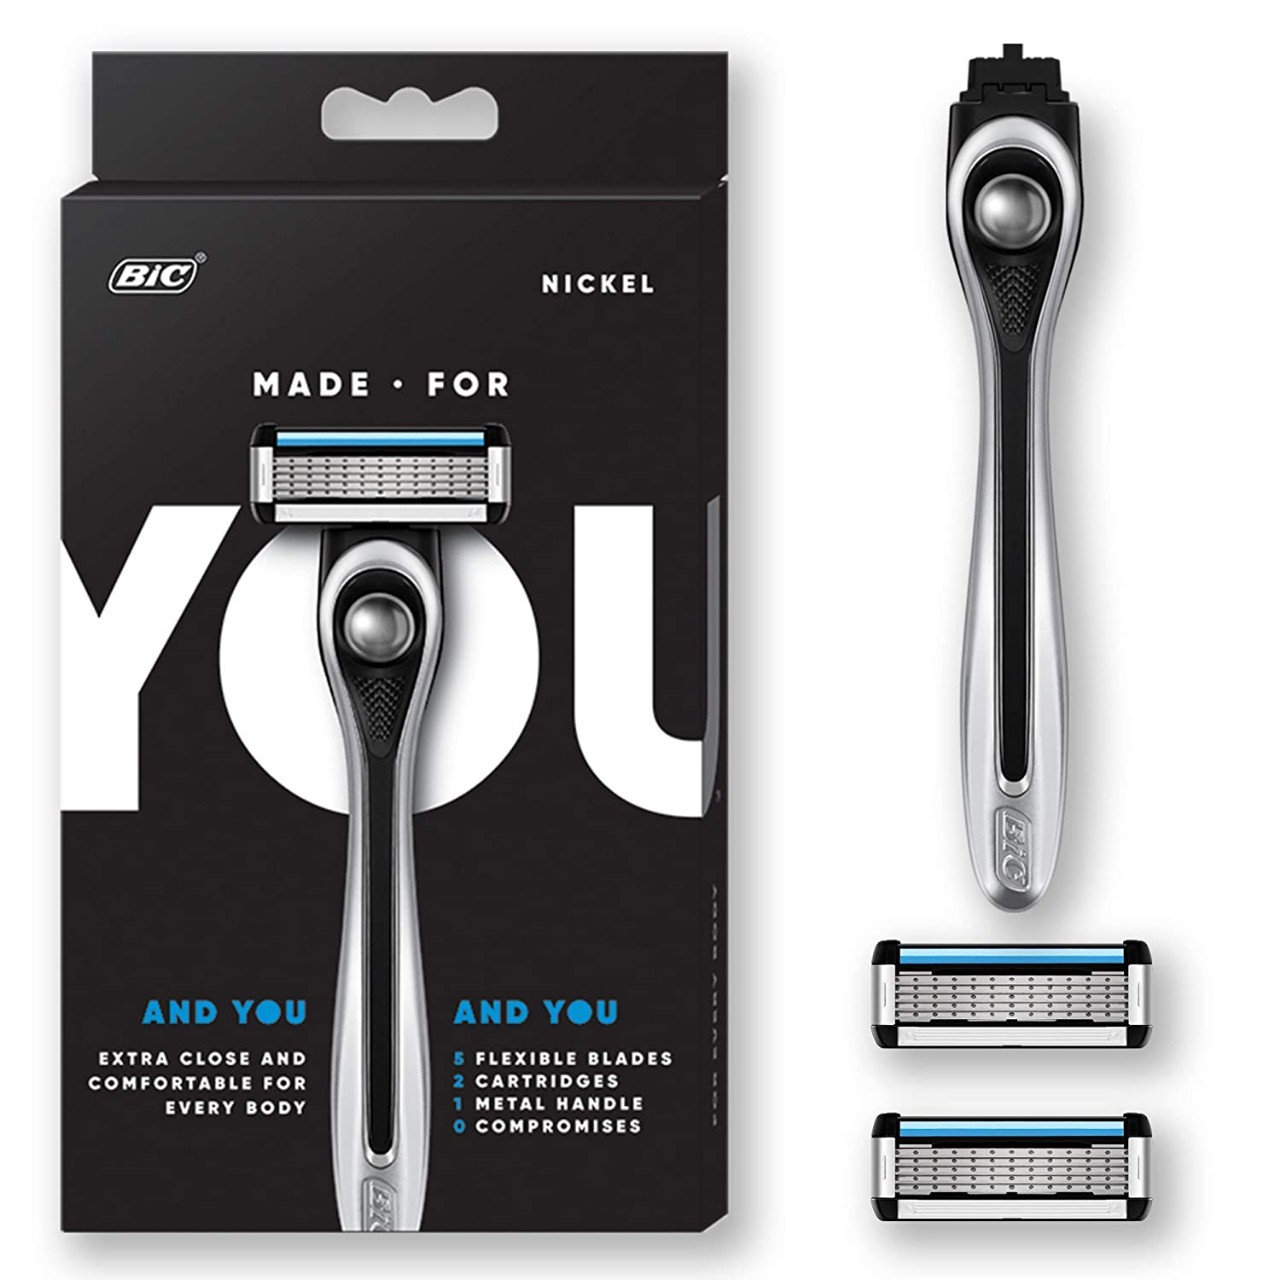 BIC Shaving Razor Blades for Every Body - Men & Women, with 2 Cartridge Refills - 5-Blade Razors